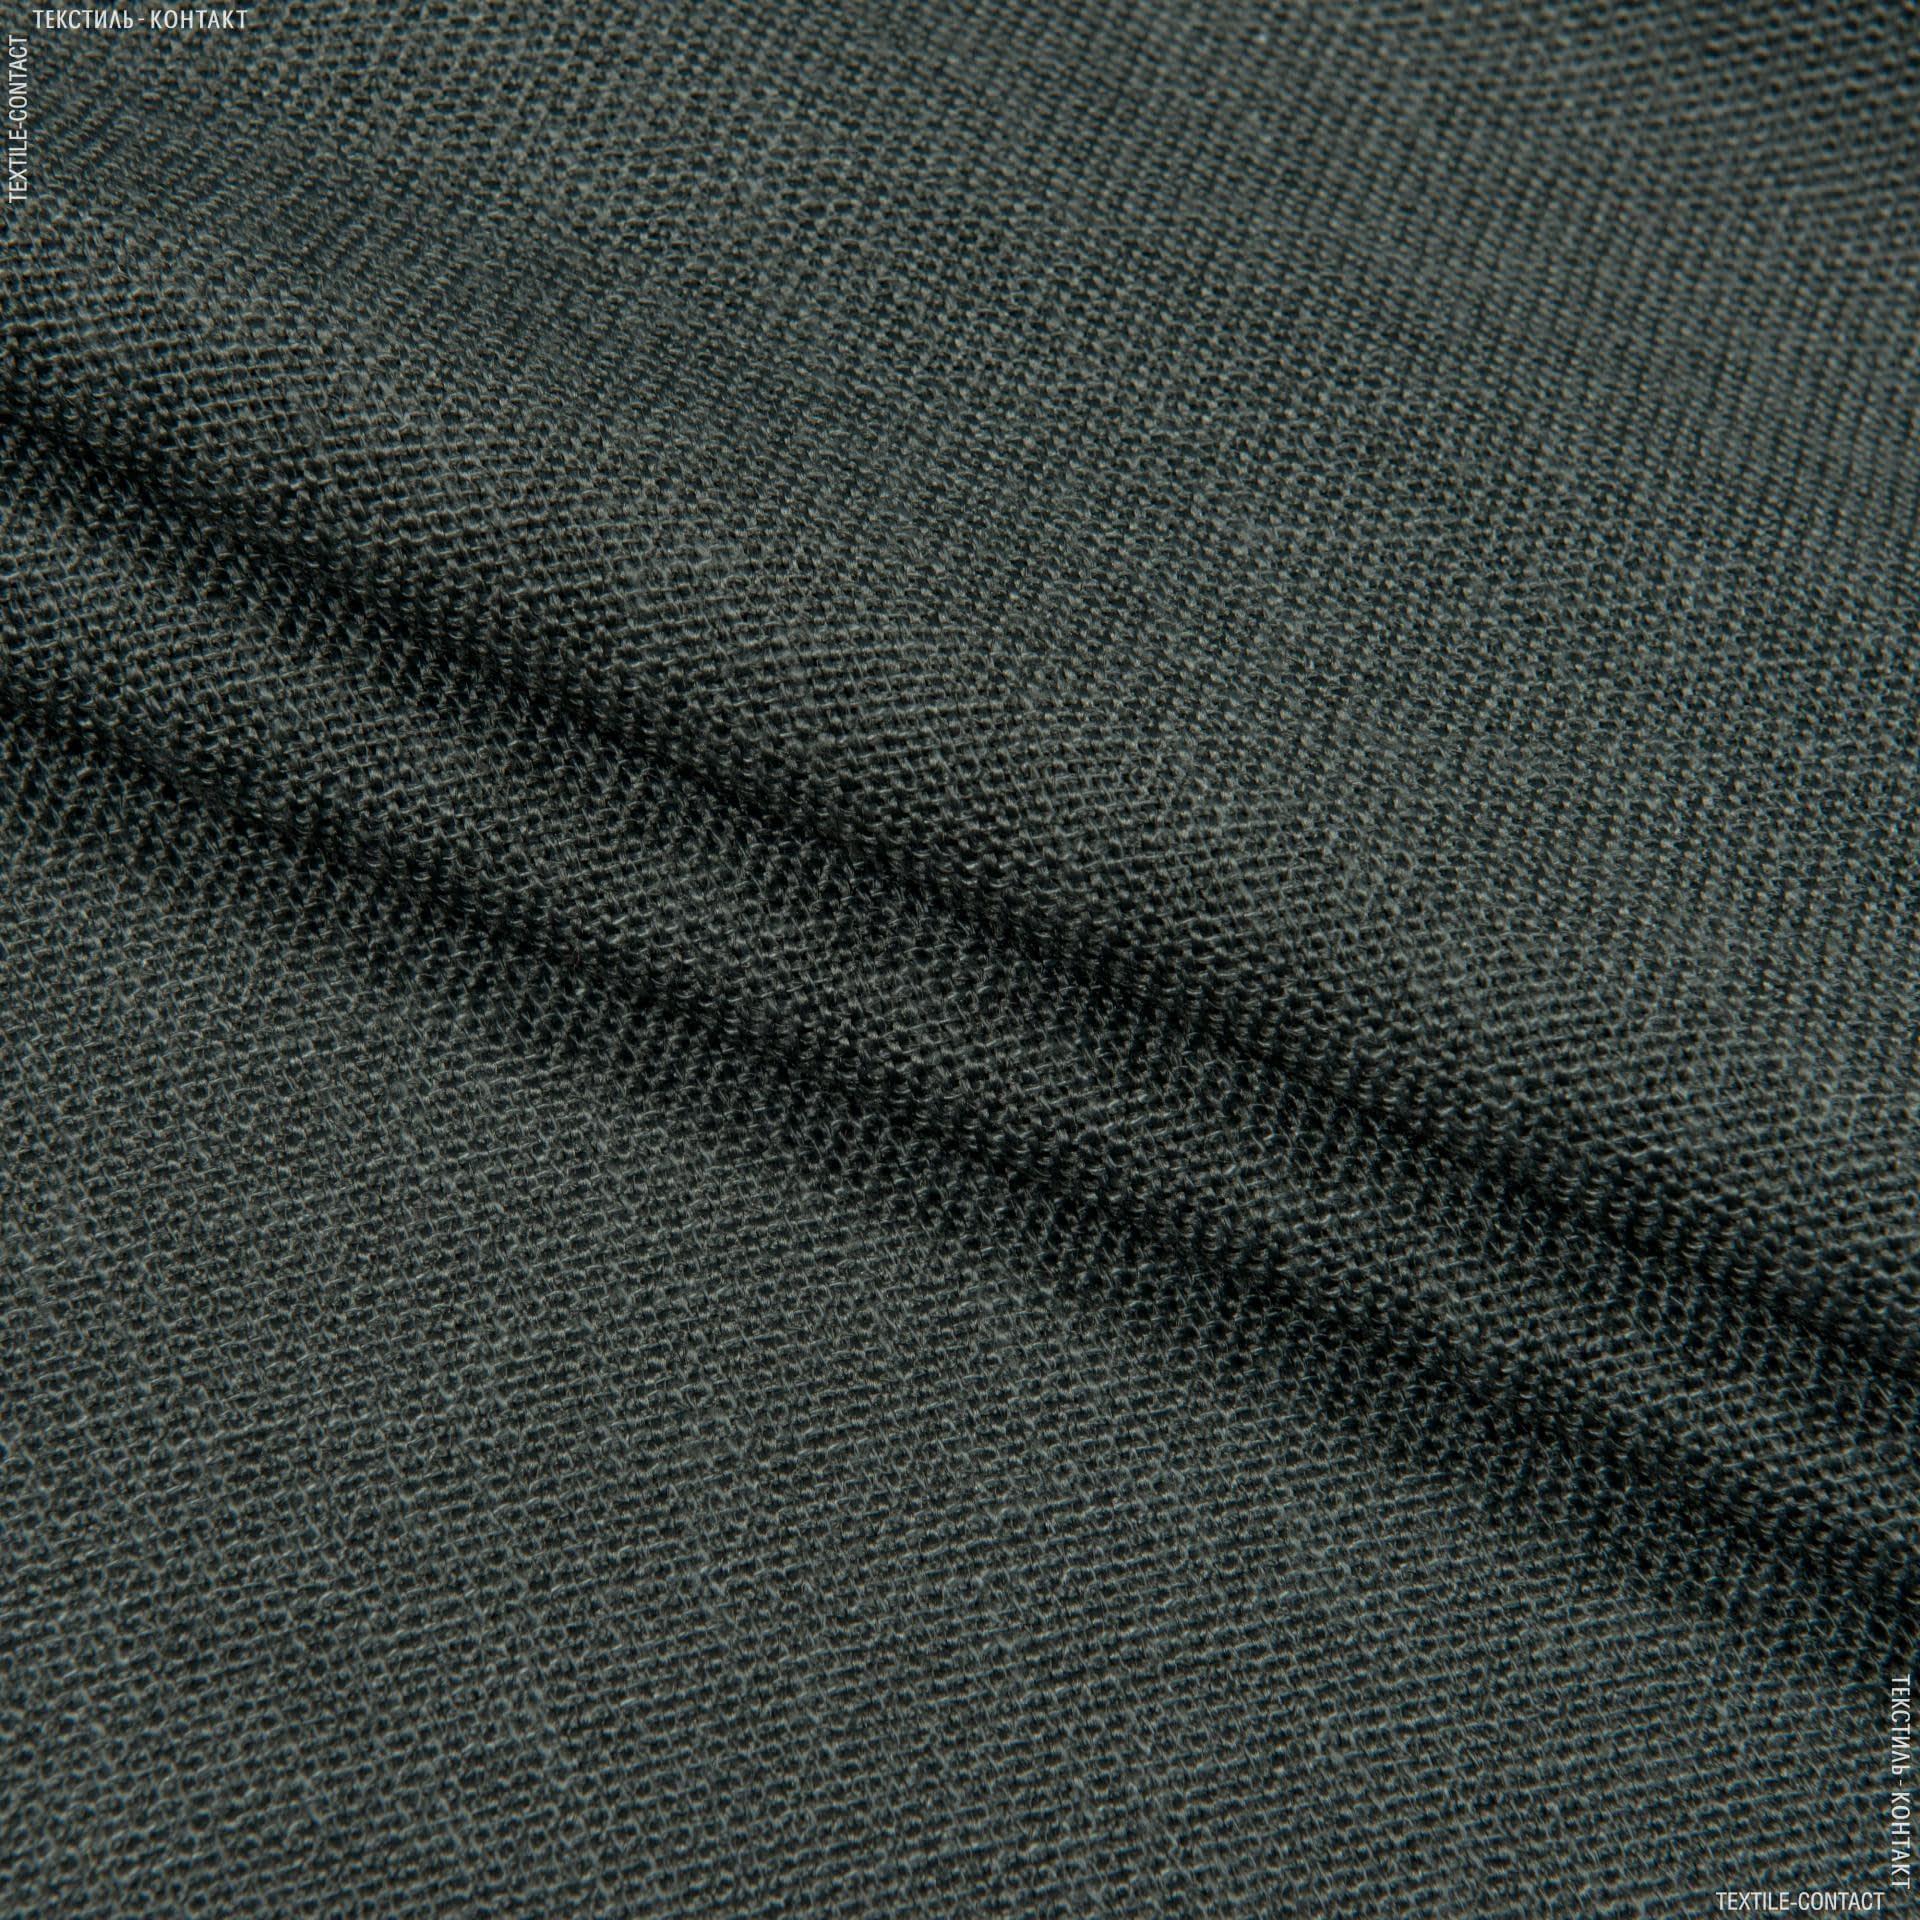 Тканини horeca - Декоративна тканина шархан /графіт